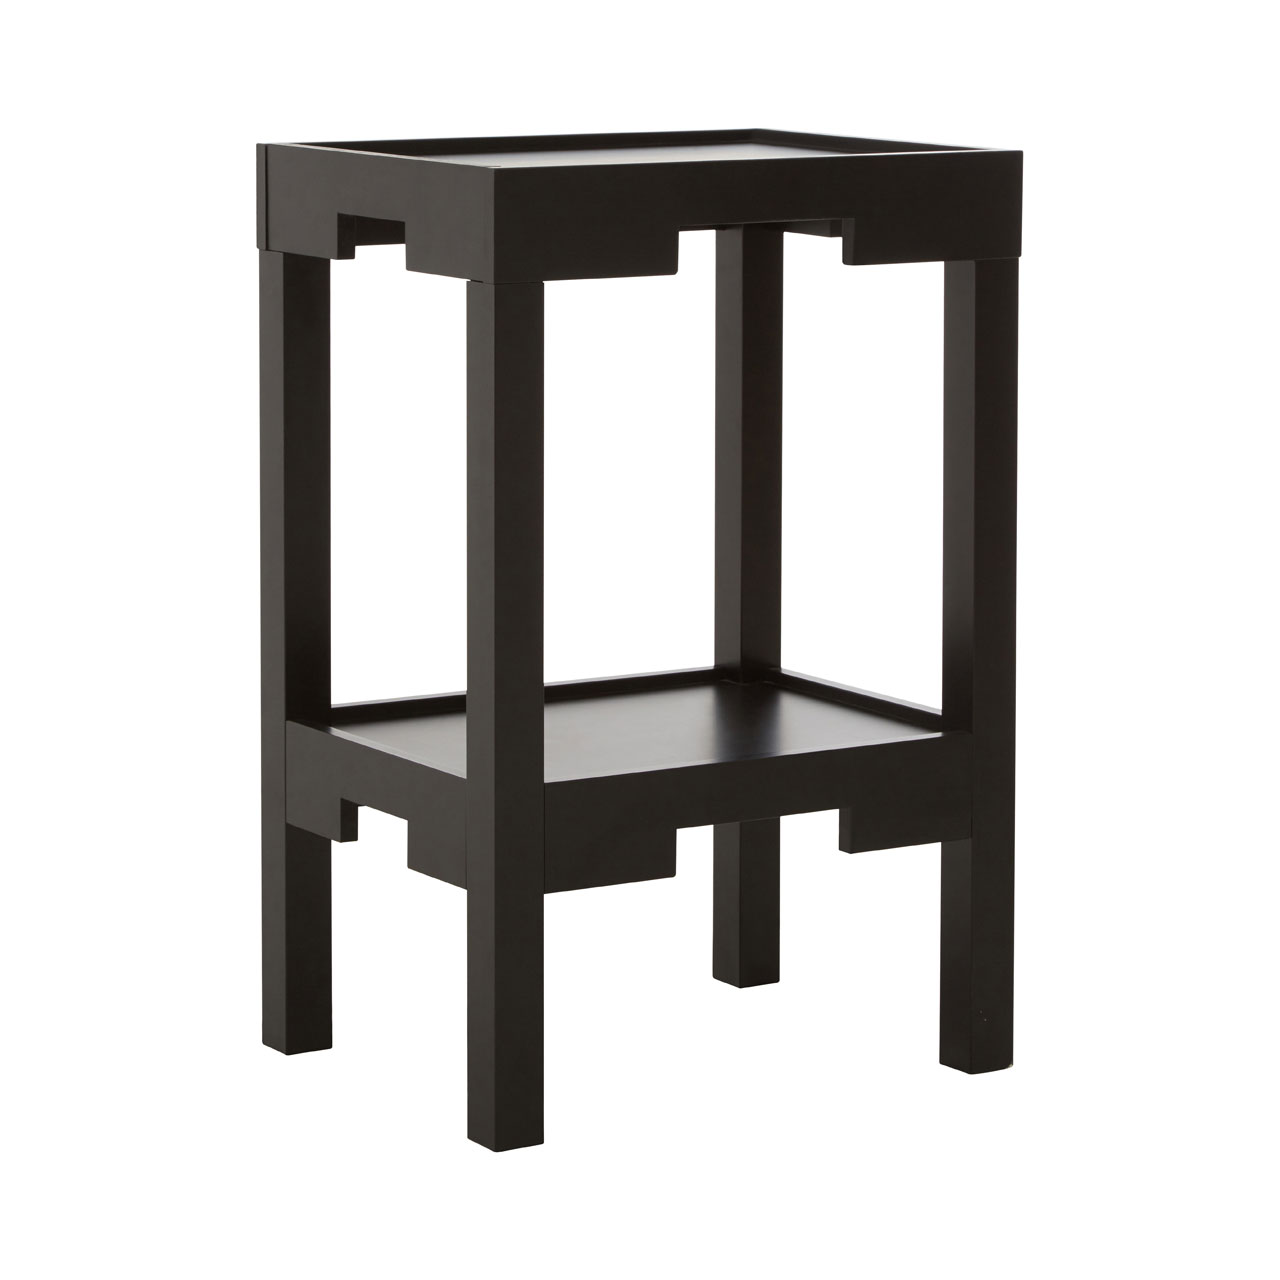 Dark Wood Coffee Table With Storage Uk: Home Hall Black Wooden Side End Coffee Table Storage Shelf